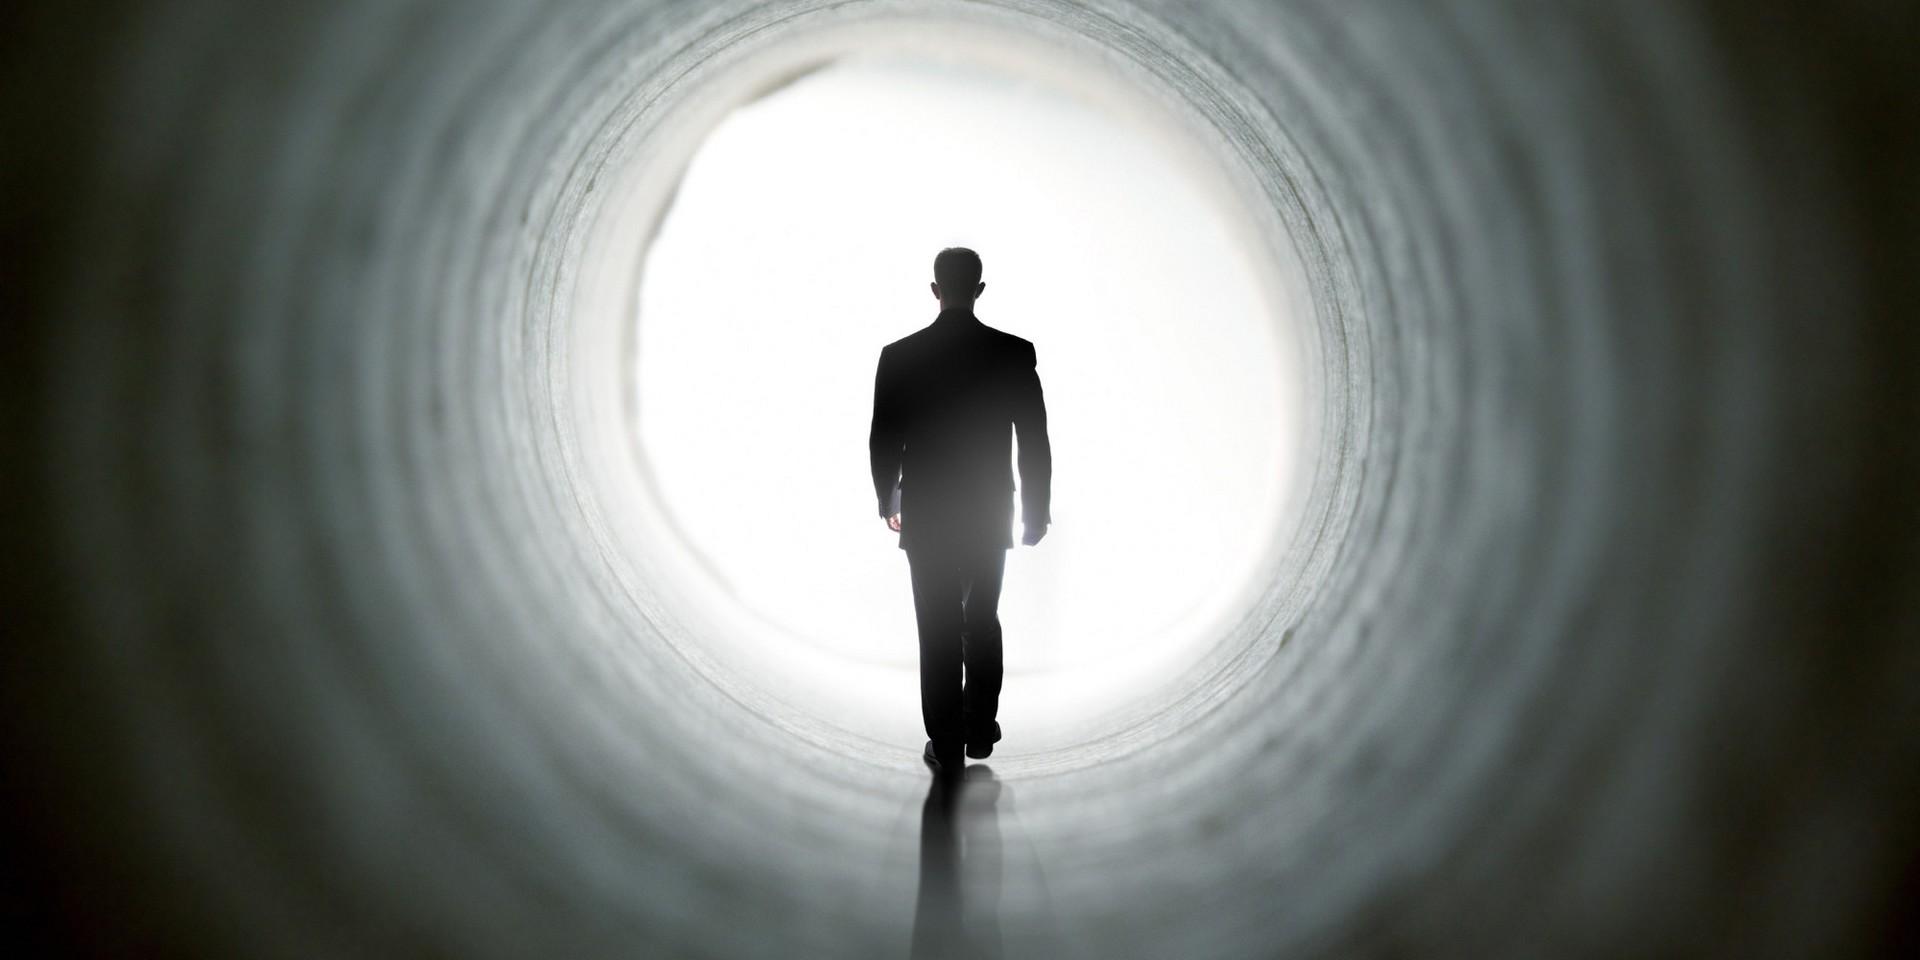 Rychvald svetlo na konci tunelu